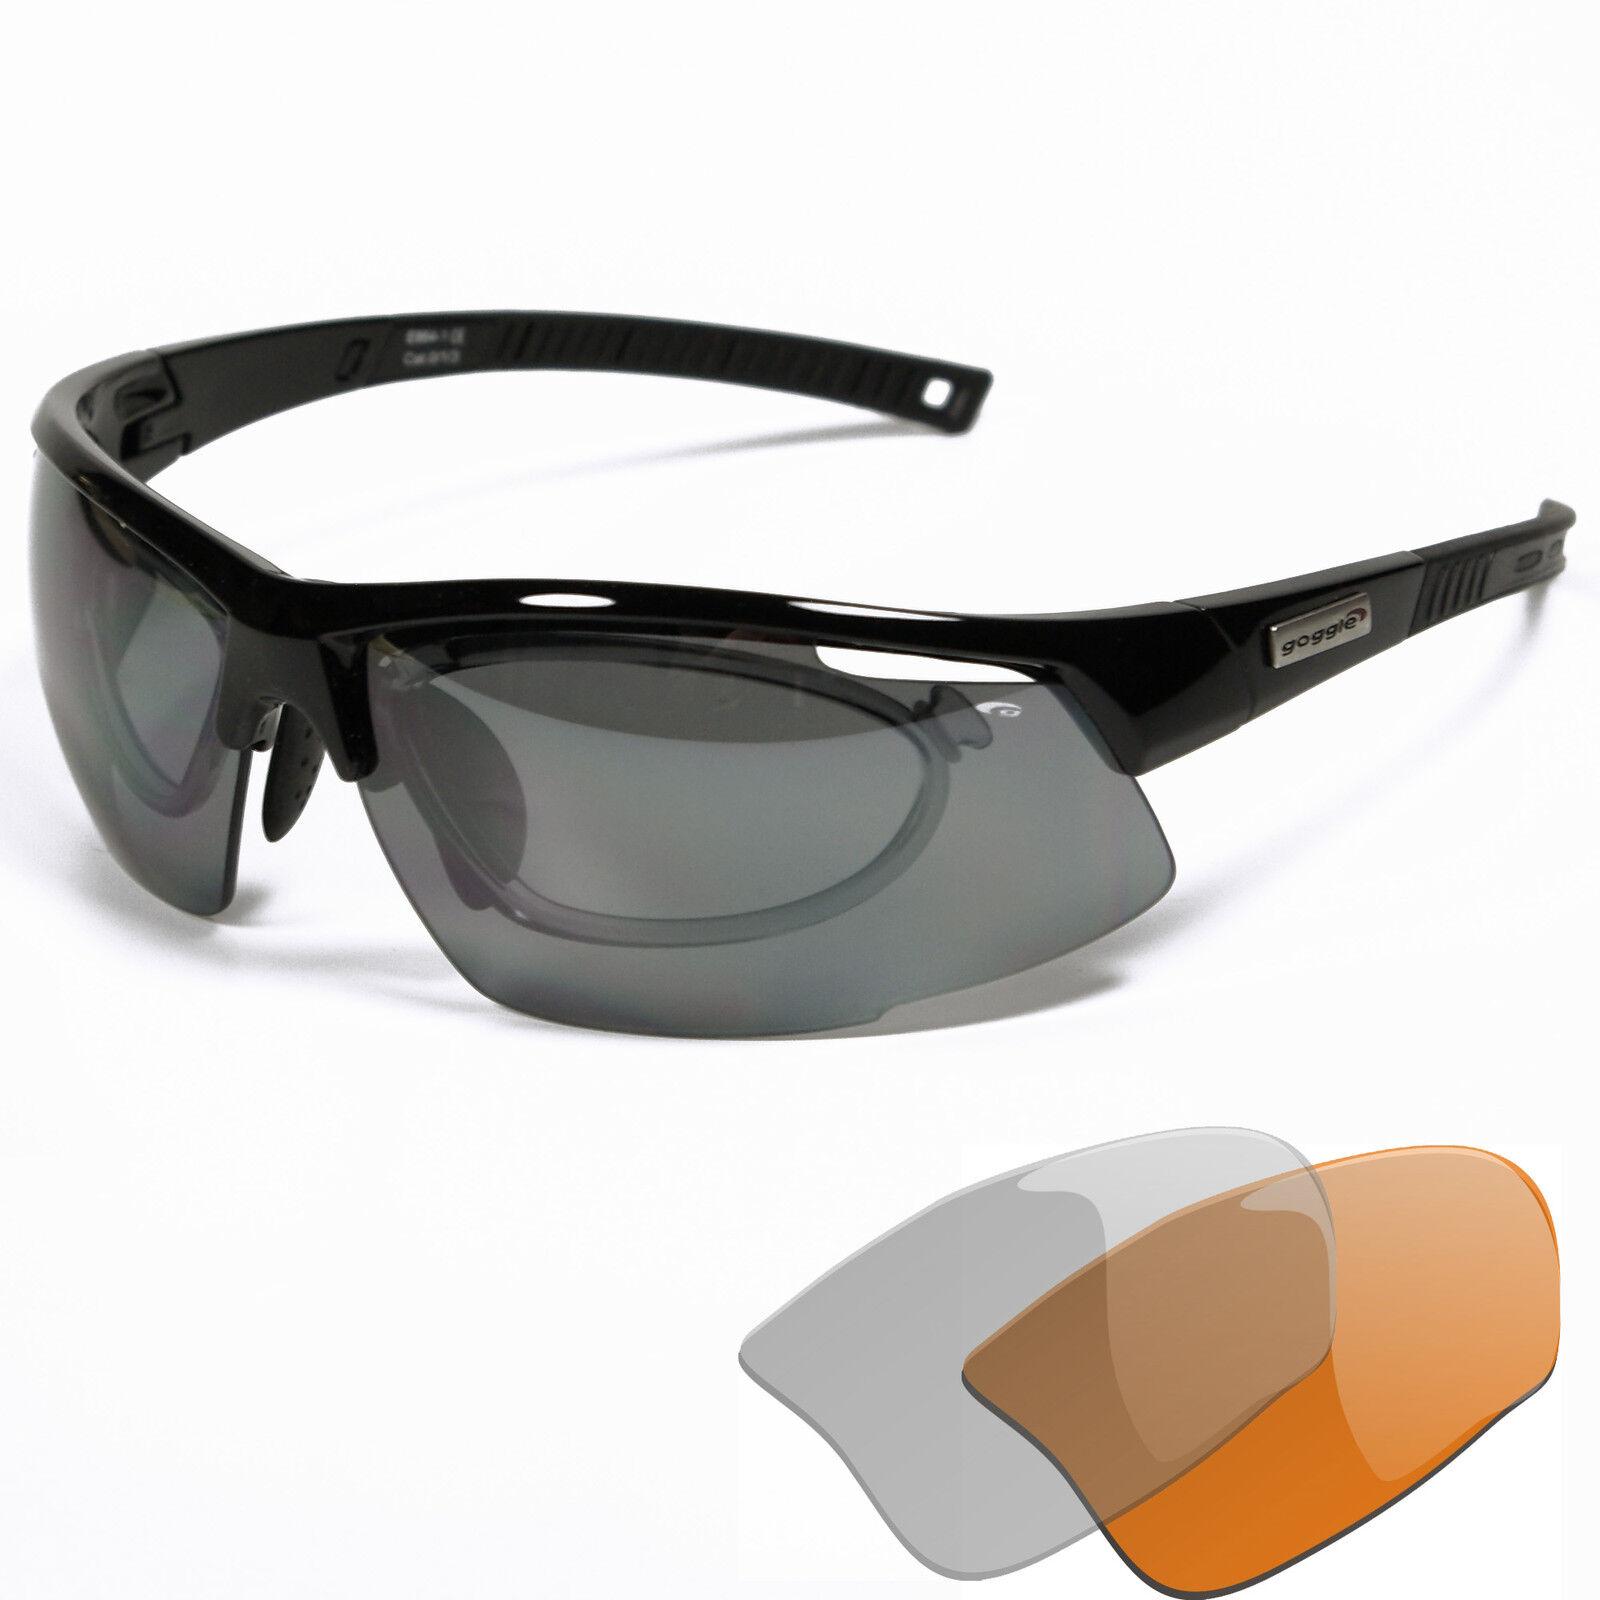 Brillenträger Brillenträger Brillenträger Radbrille Sportbrille mit Optik-Clip bd19df